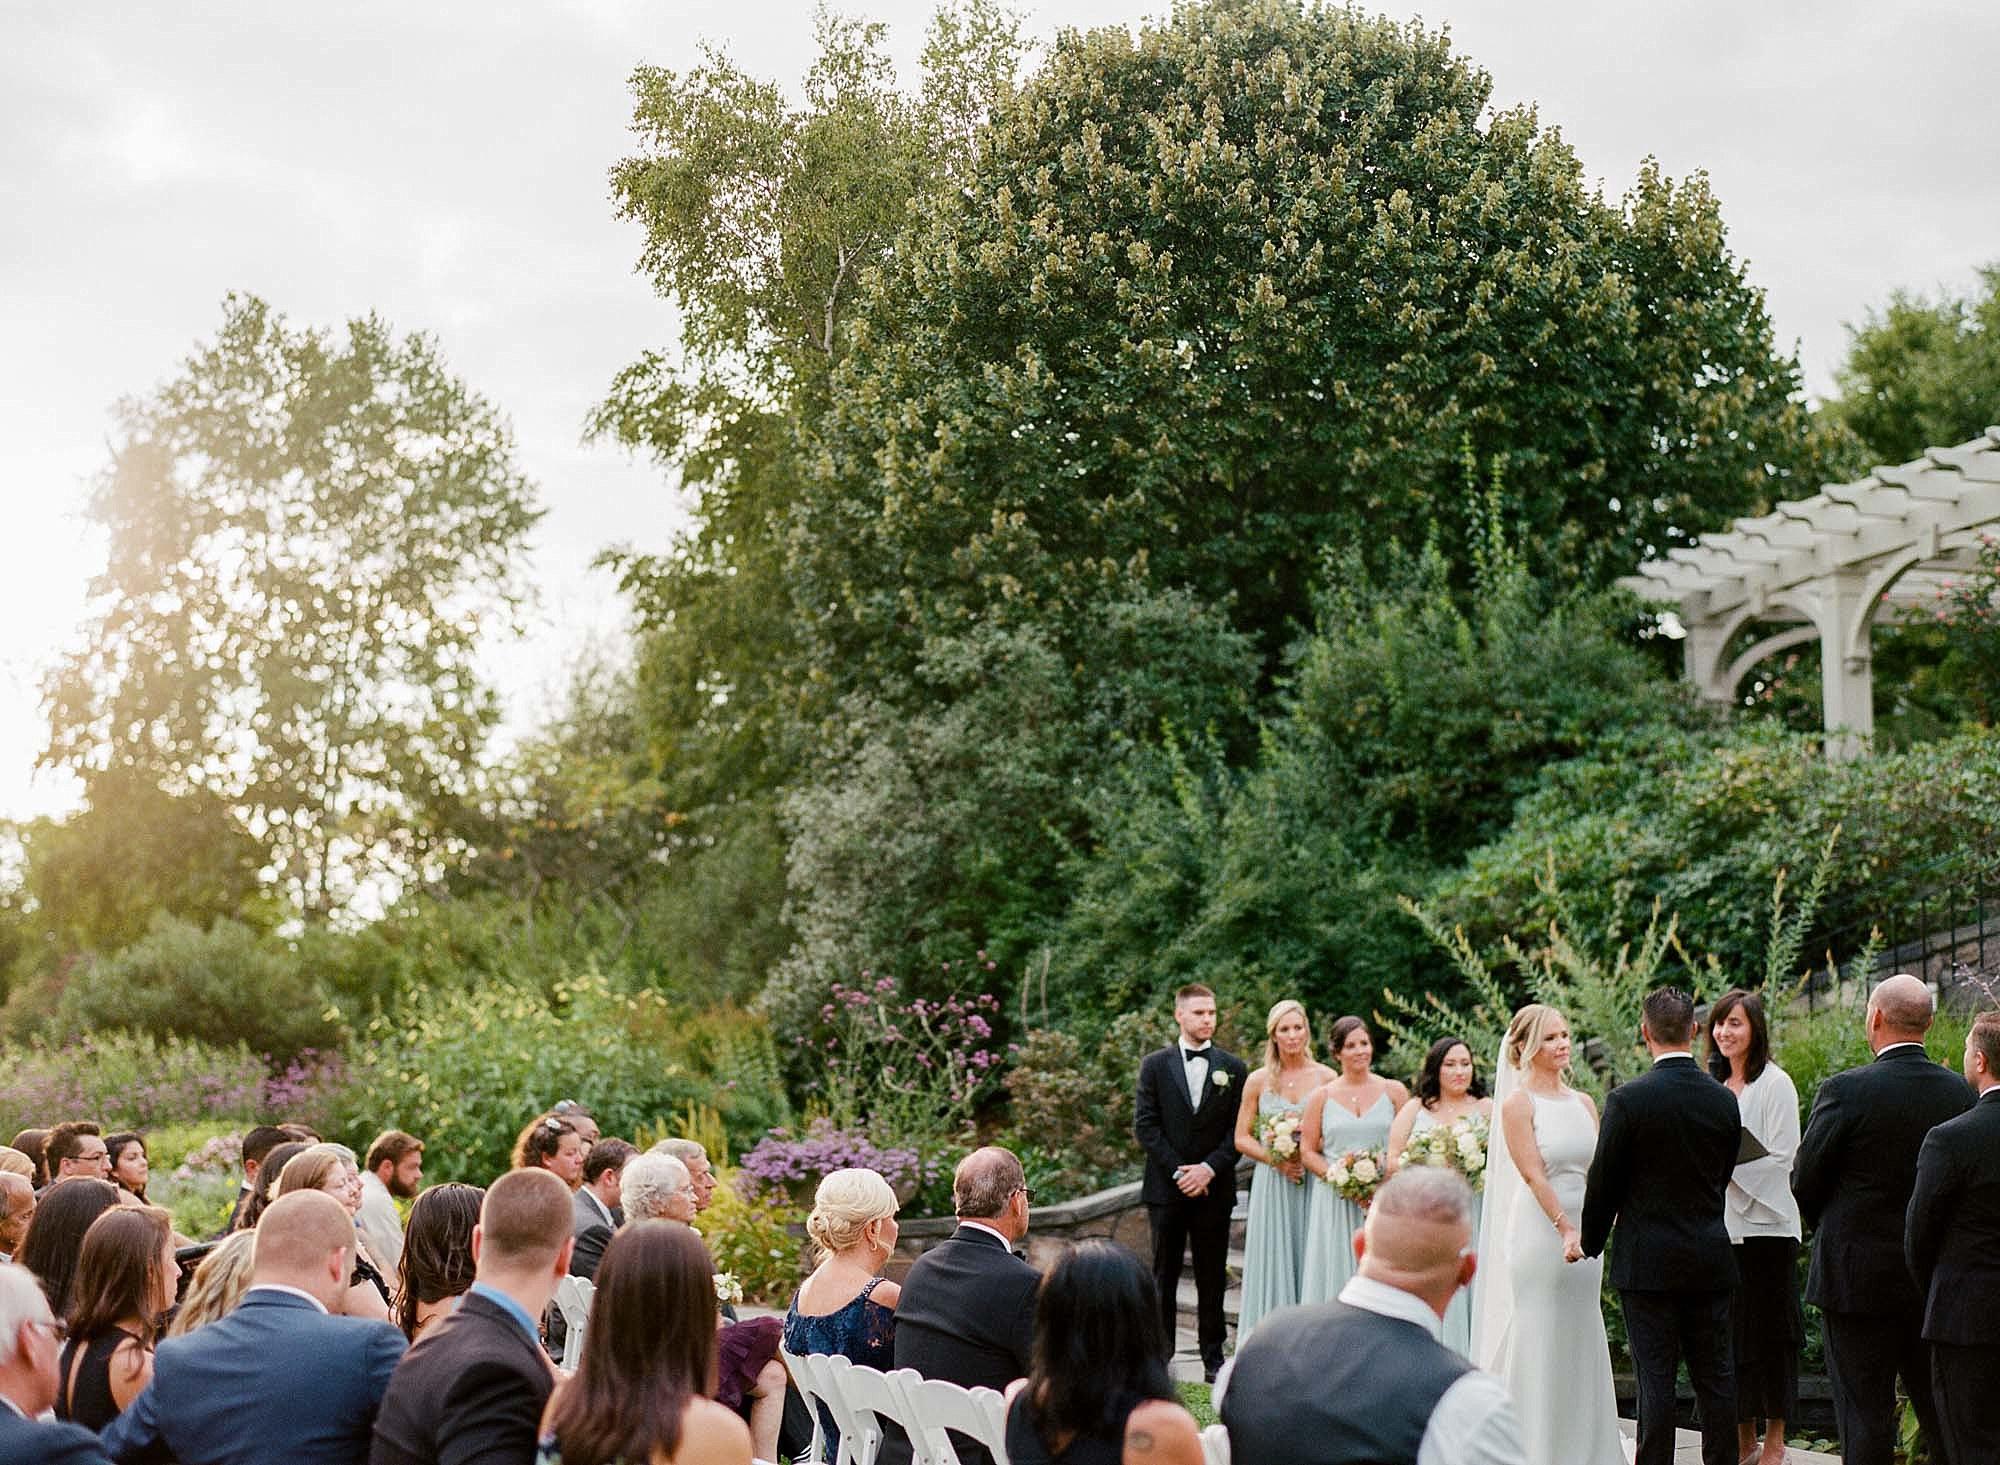 Tower hill wedding - ebersole photo-1.jpg